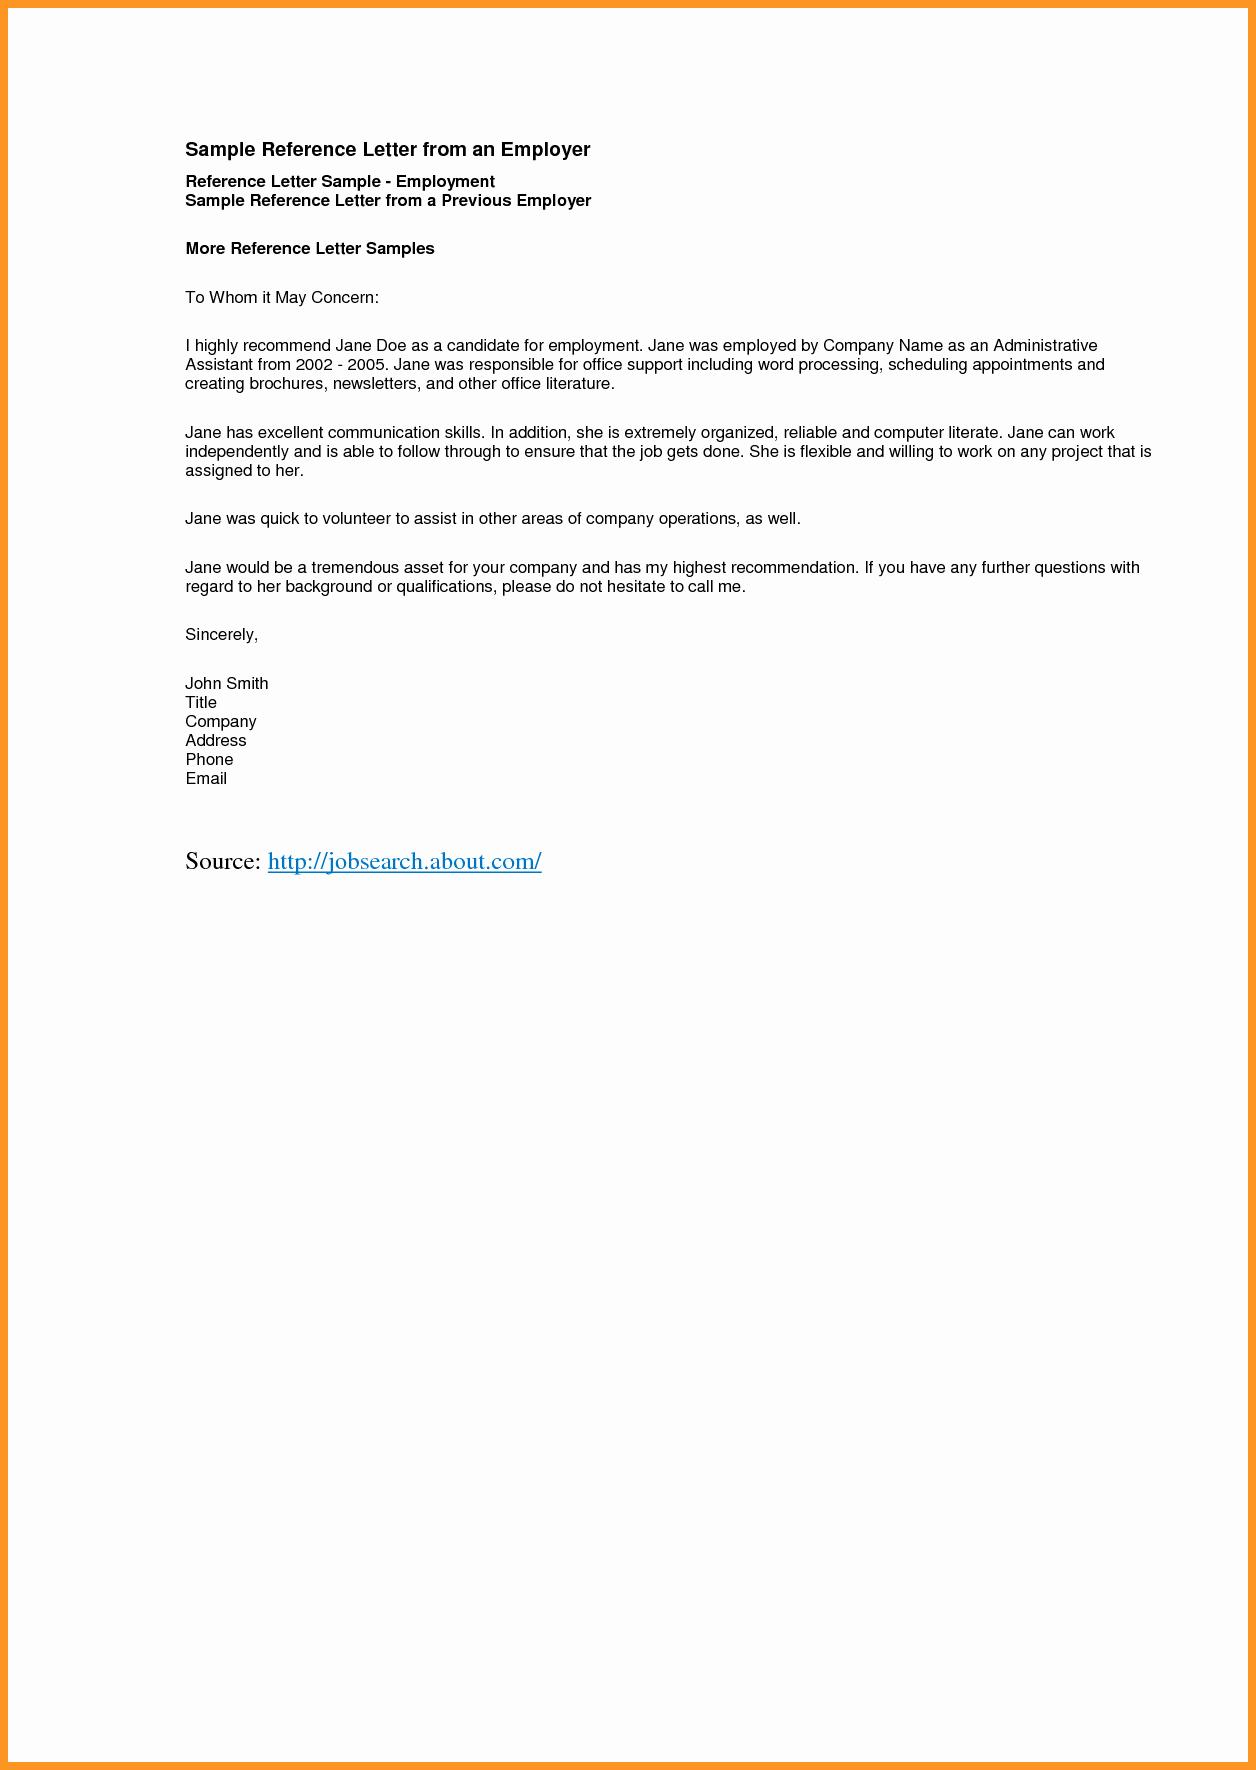 Job Recommendation Letter Sample Unique 9 10 Re Mendation Letter Samples for Employment